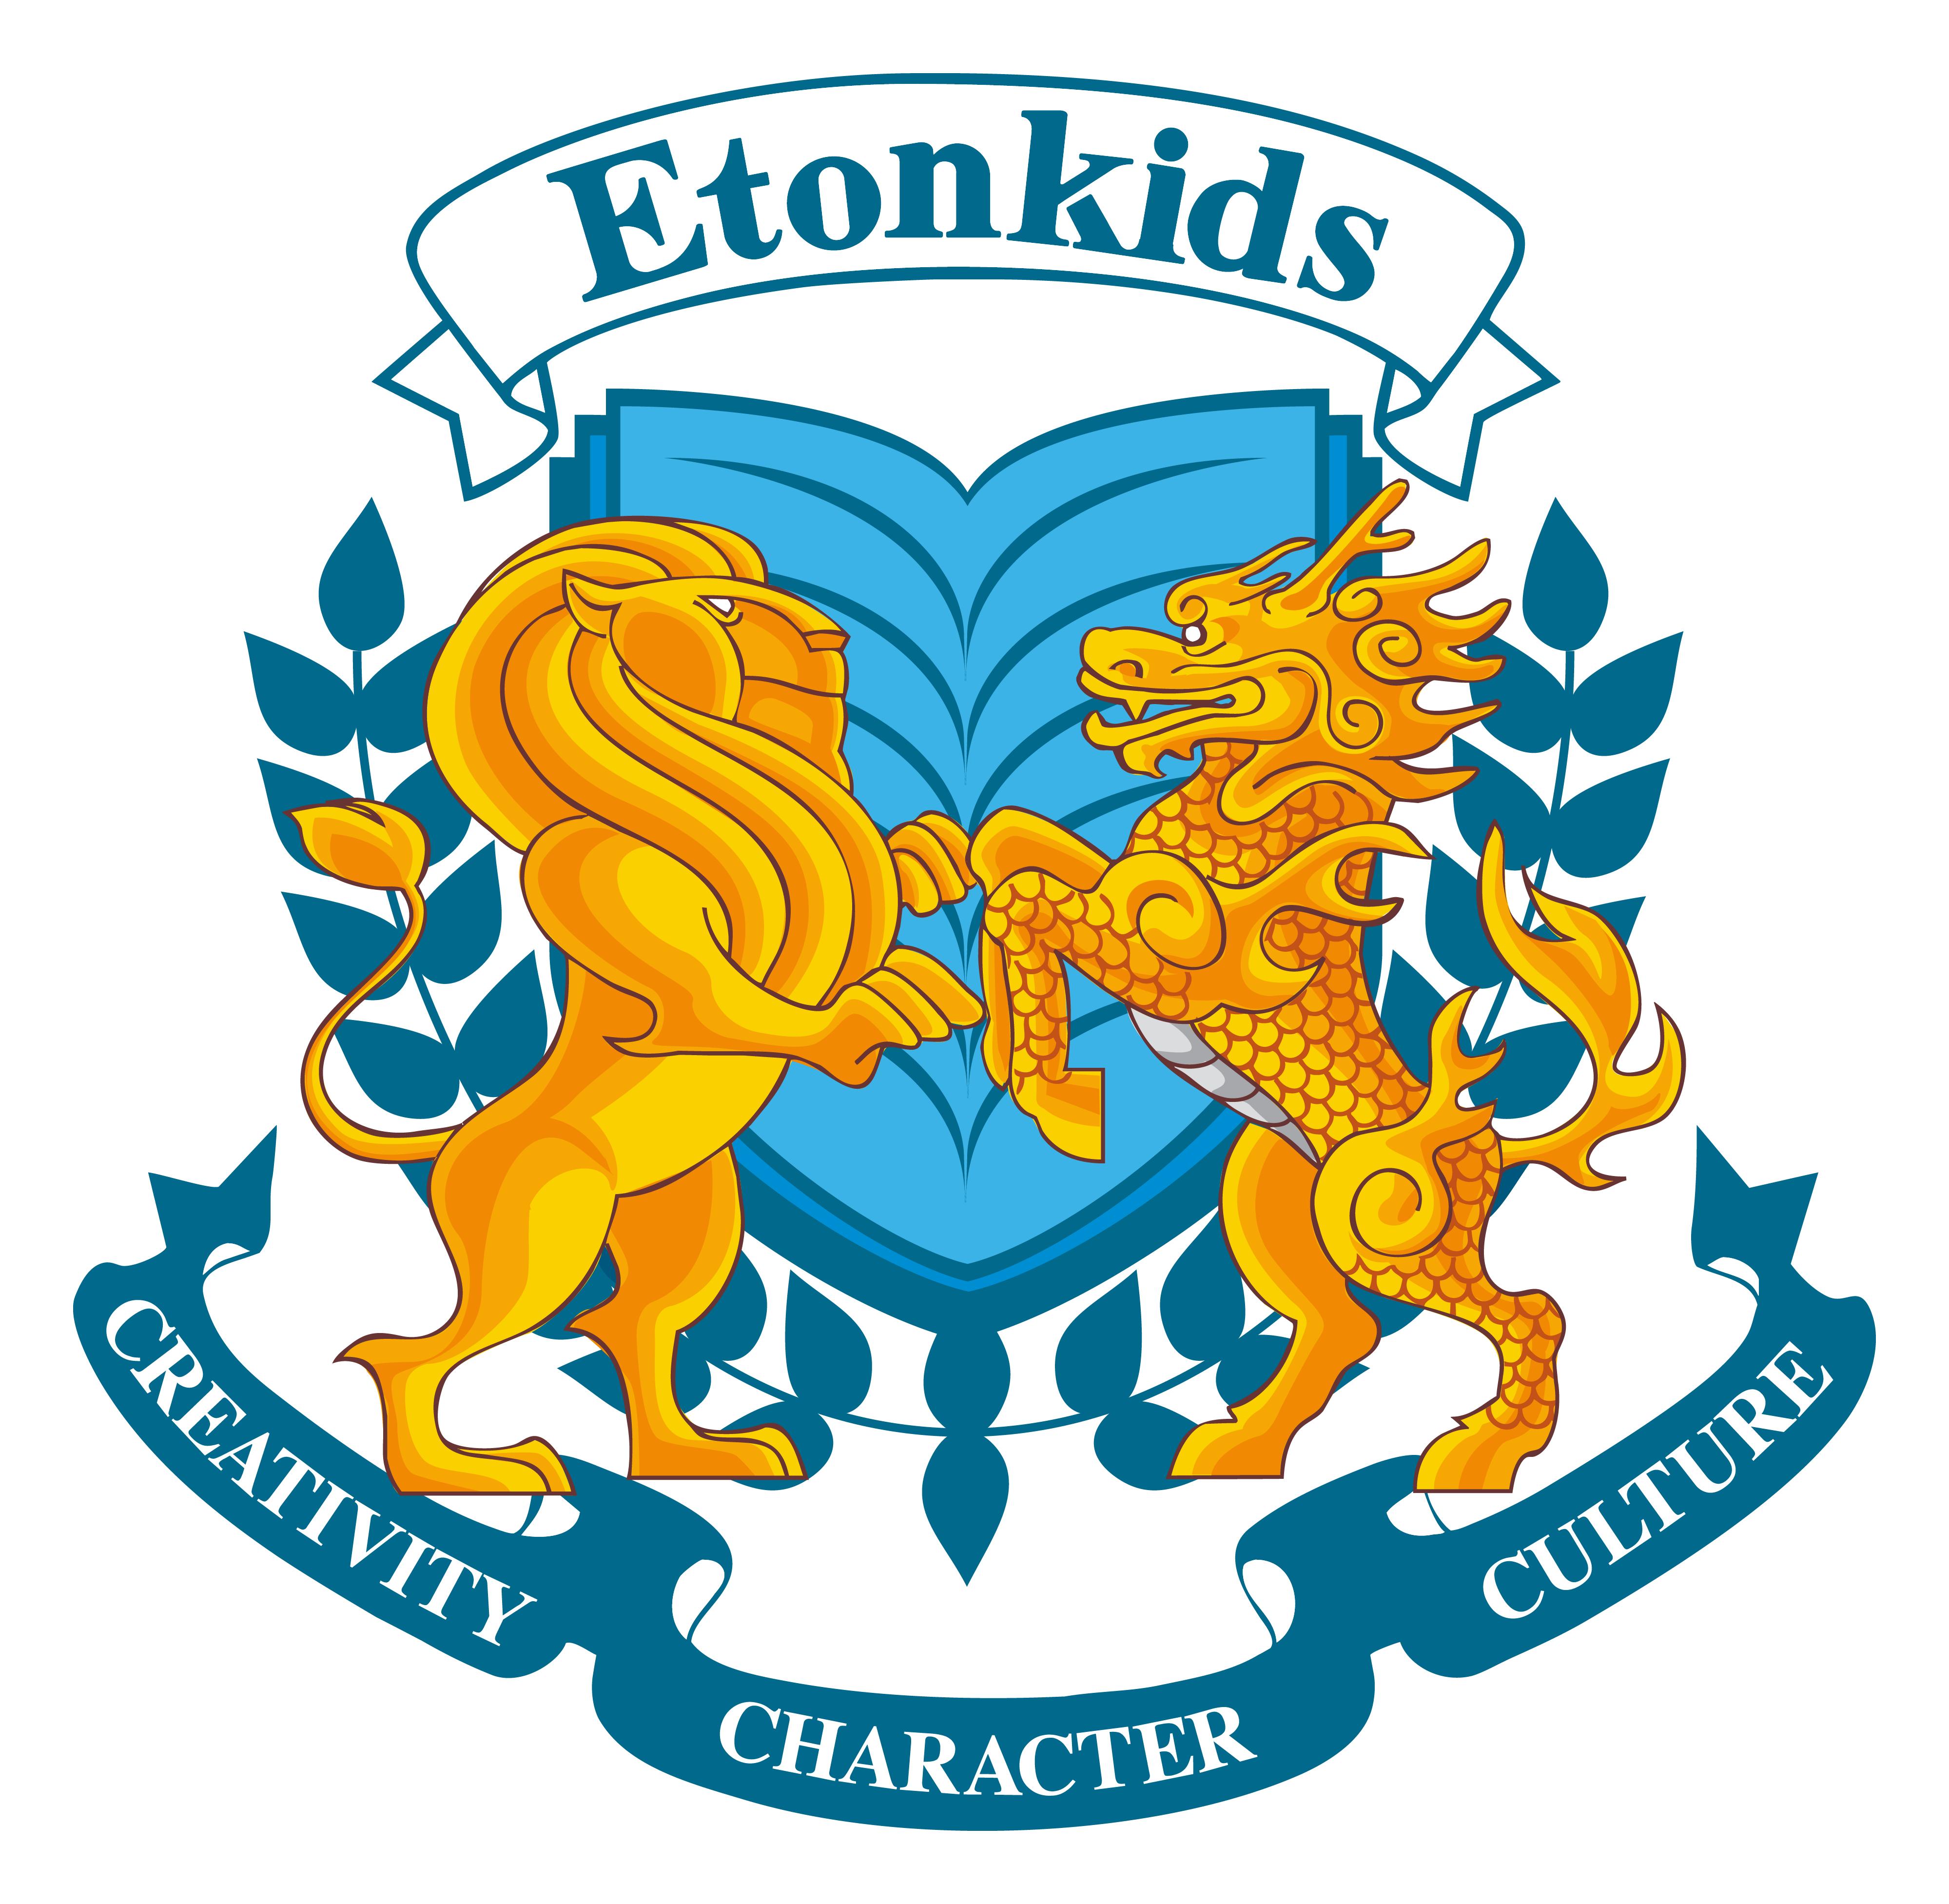 High school english teacher clipart clipart black and white Etonkids Educational Group | Teach Away Inc. clipart black and white